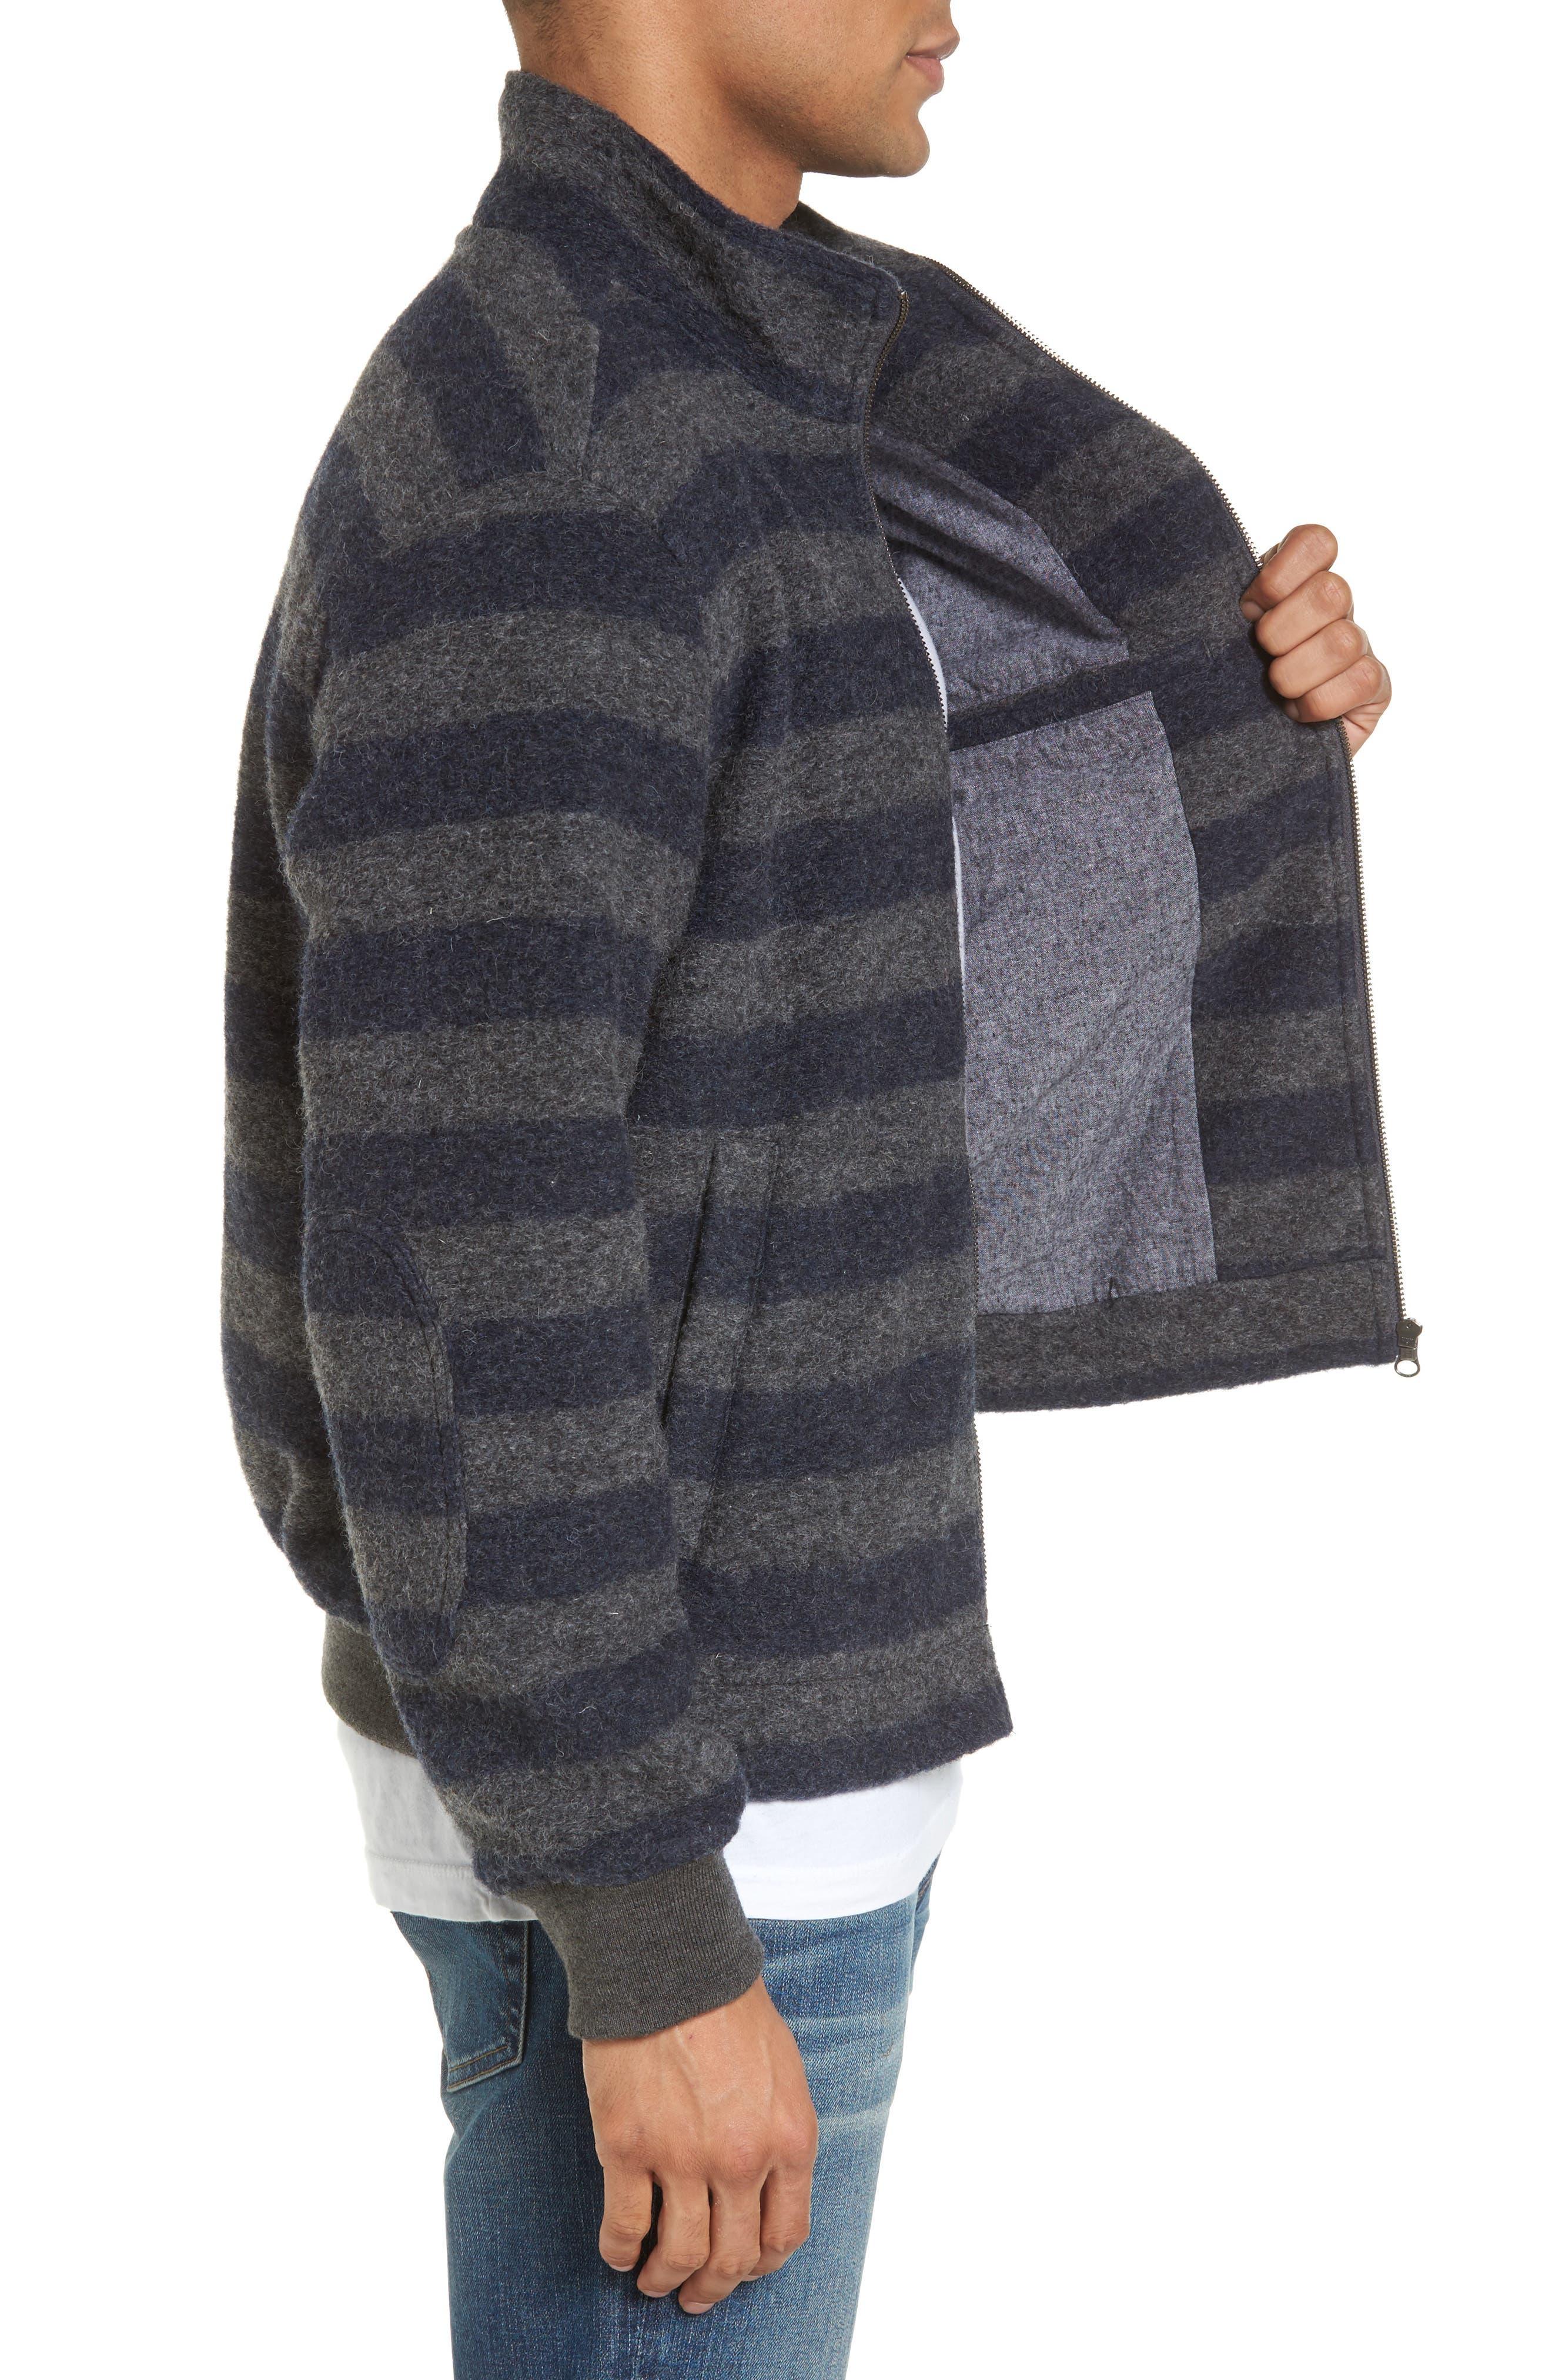 Bowen Stripe Zip Front Jacket,                             Alternate thumbnail 3, color,                             Grey Navy Stripe